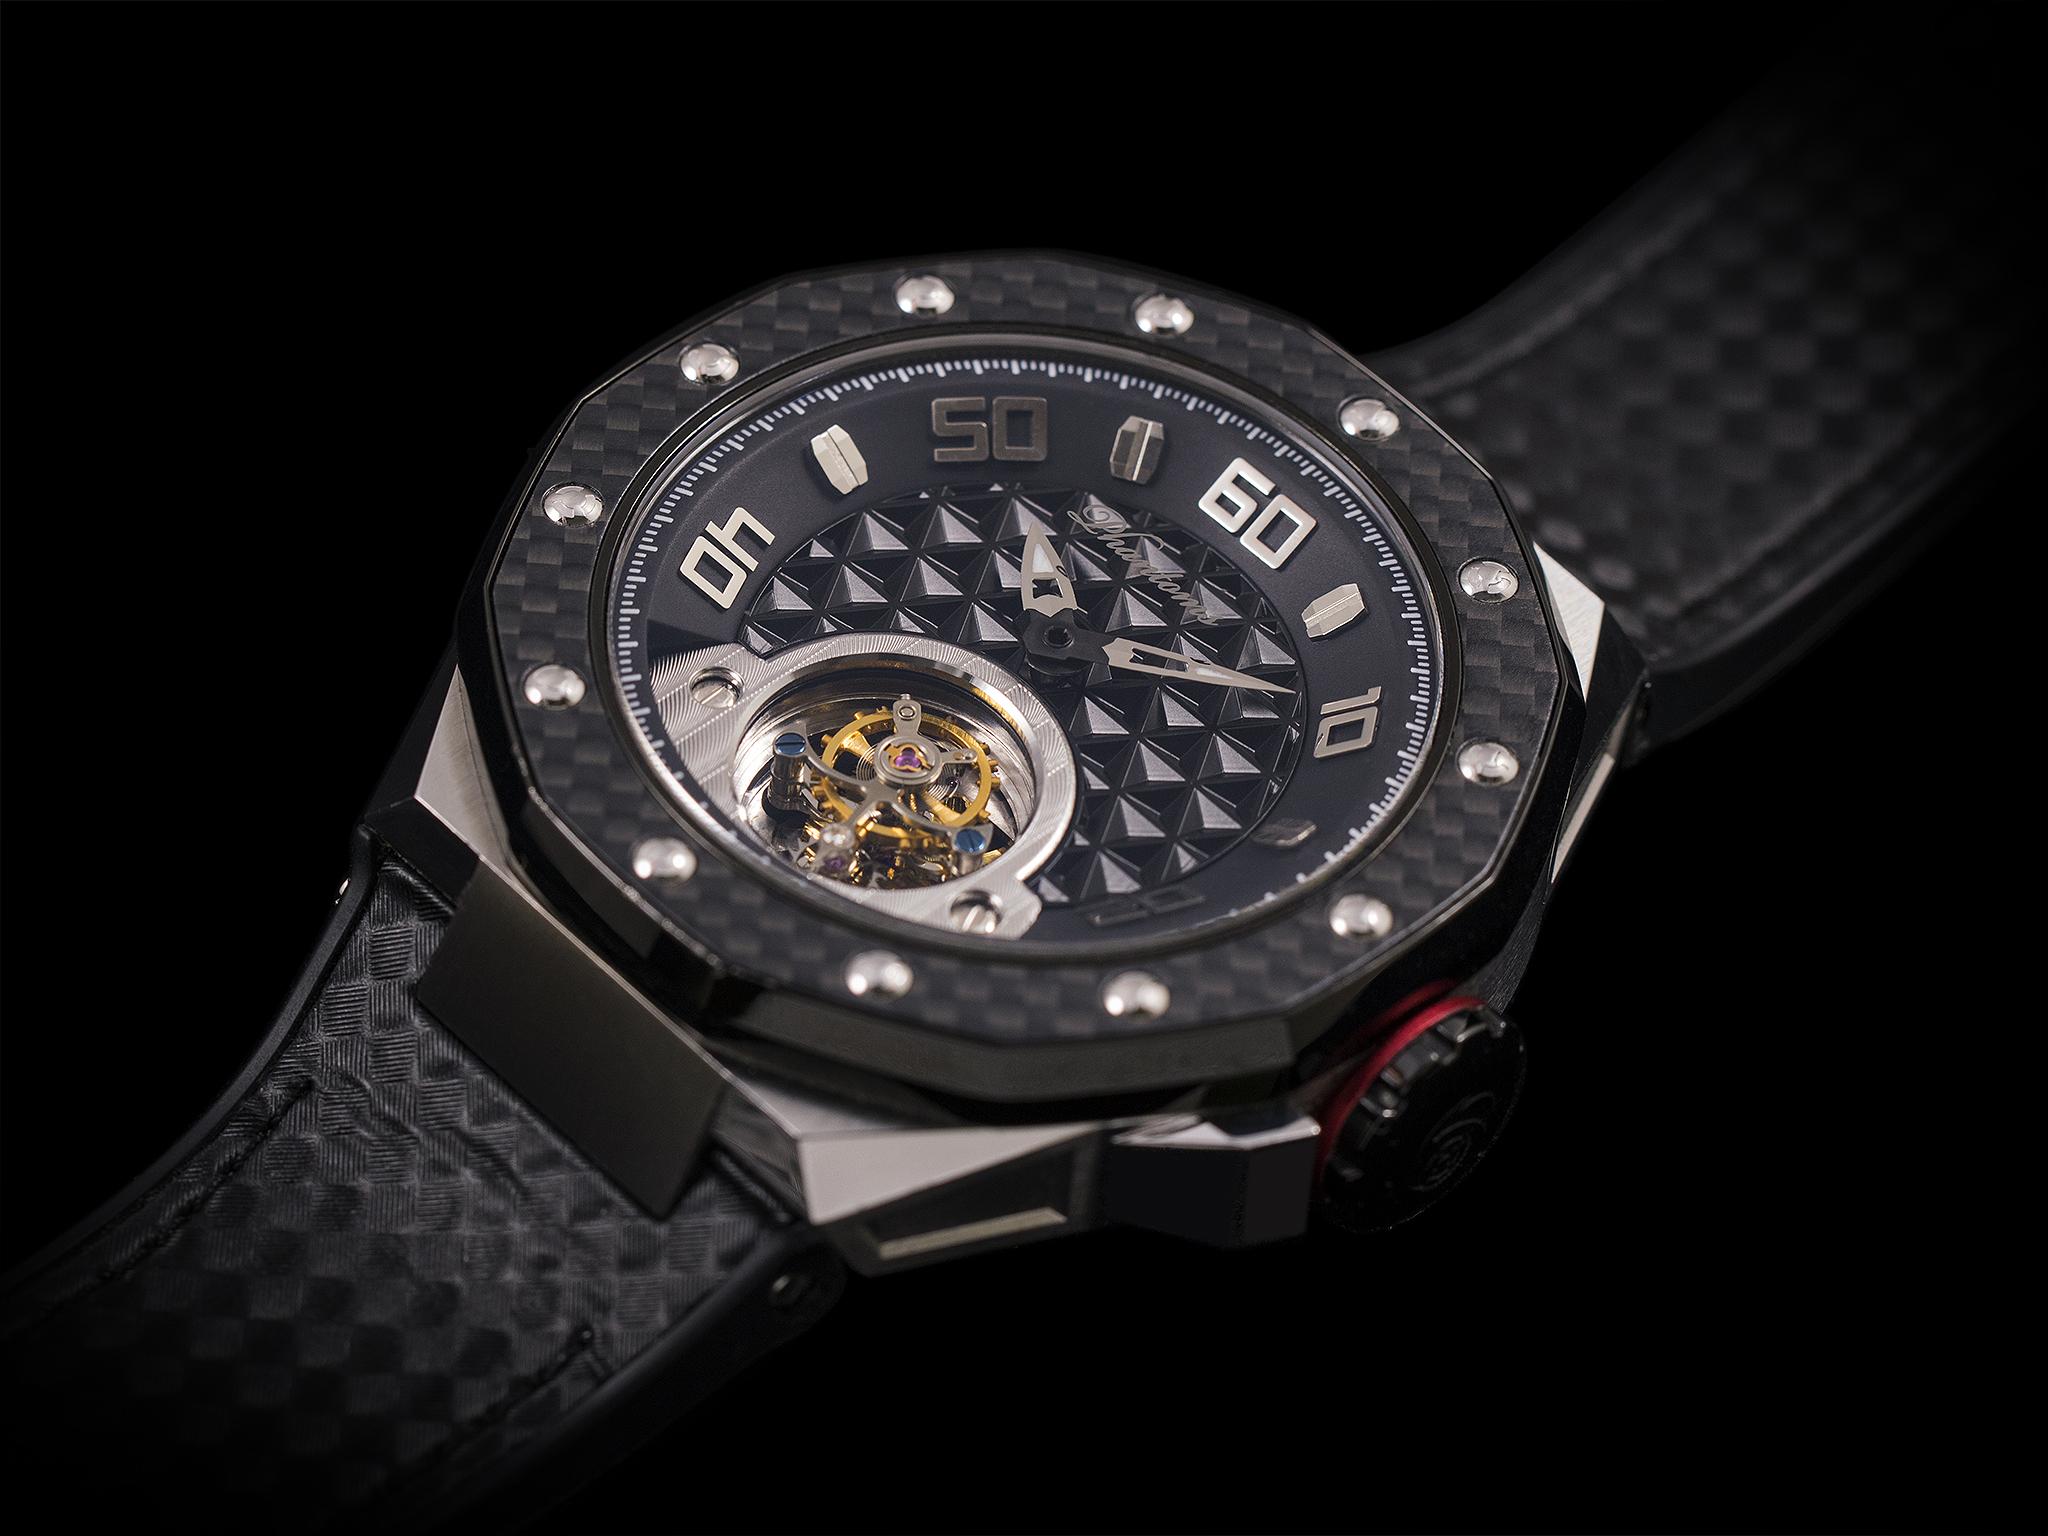 Phantoms Chaotic Shield Flying Tourbillon Mechanical Watch